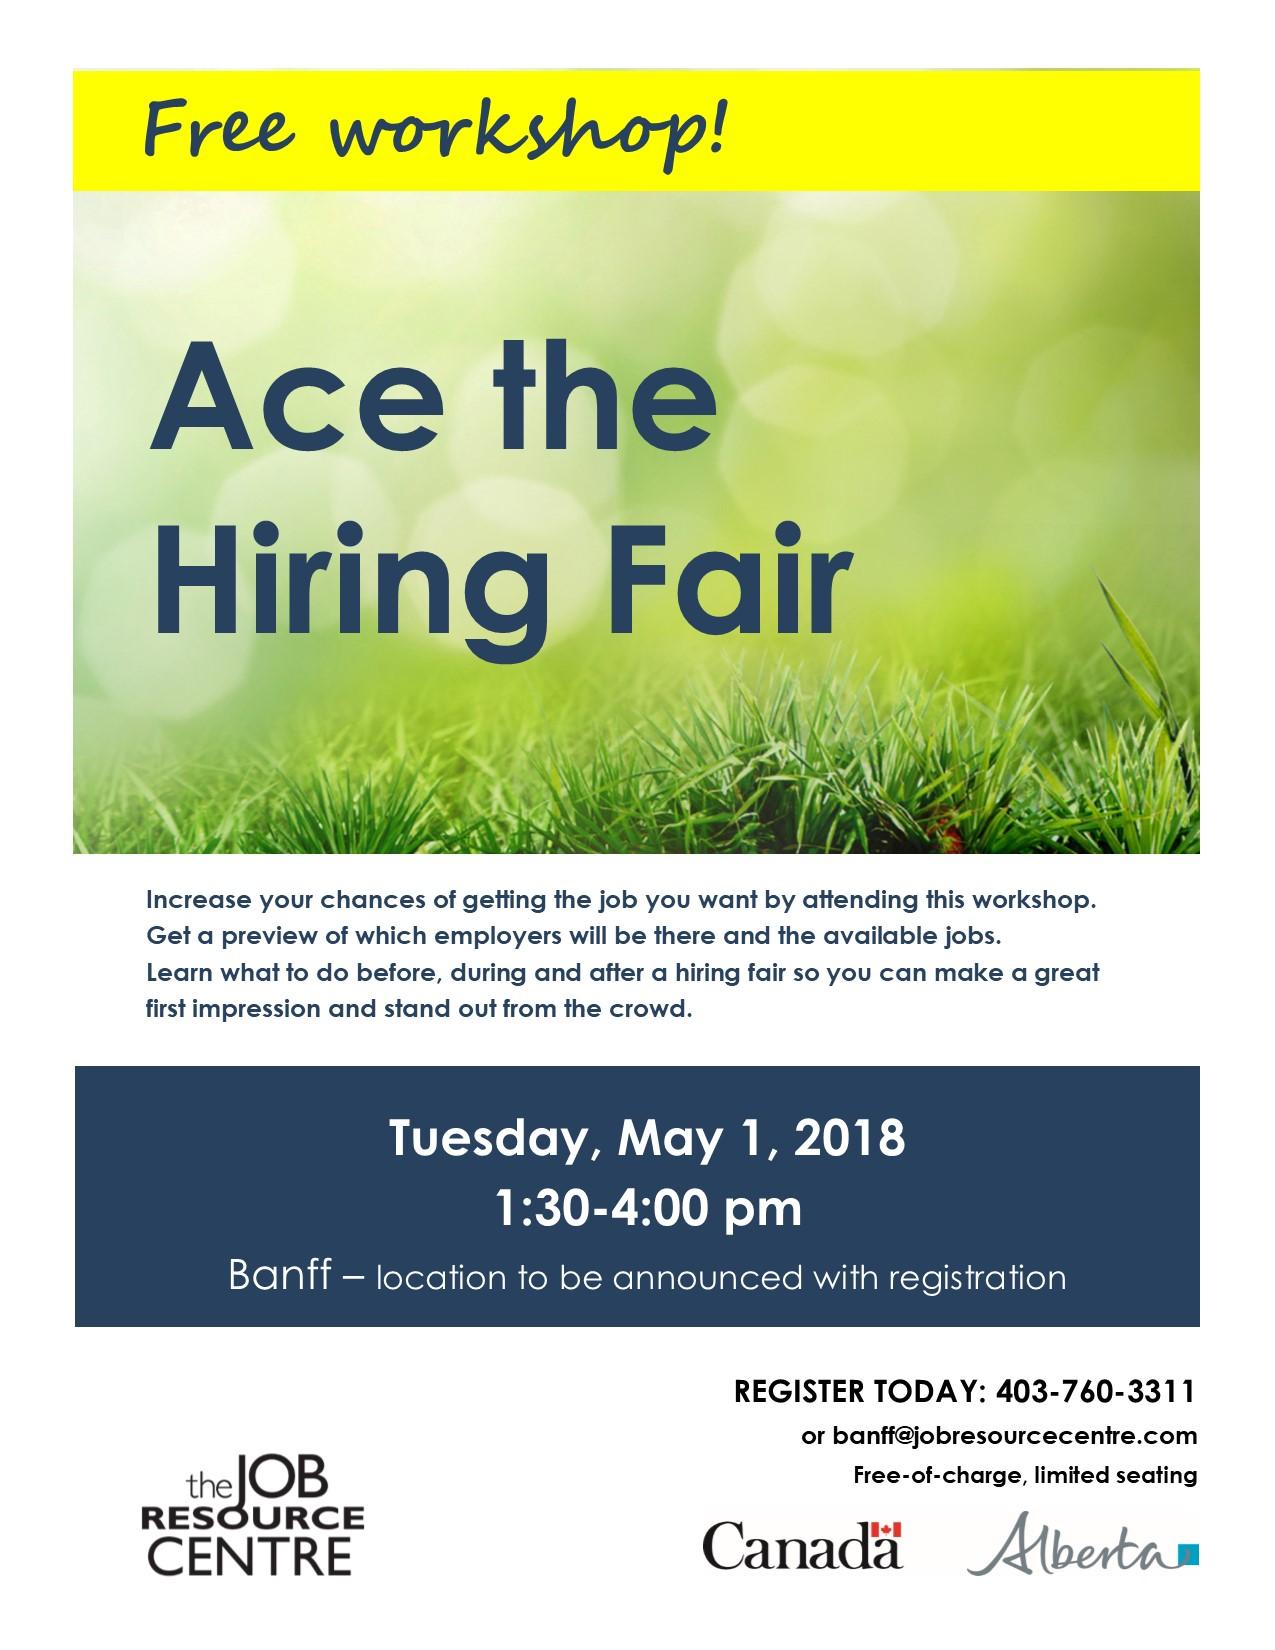 Banff Ace the Hiring Fair poster spring 2018.jpg